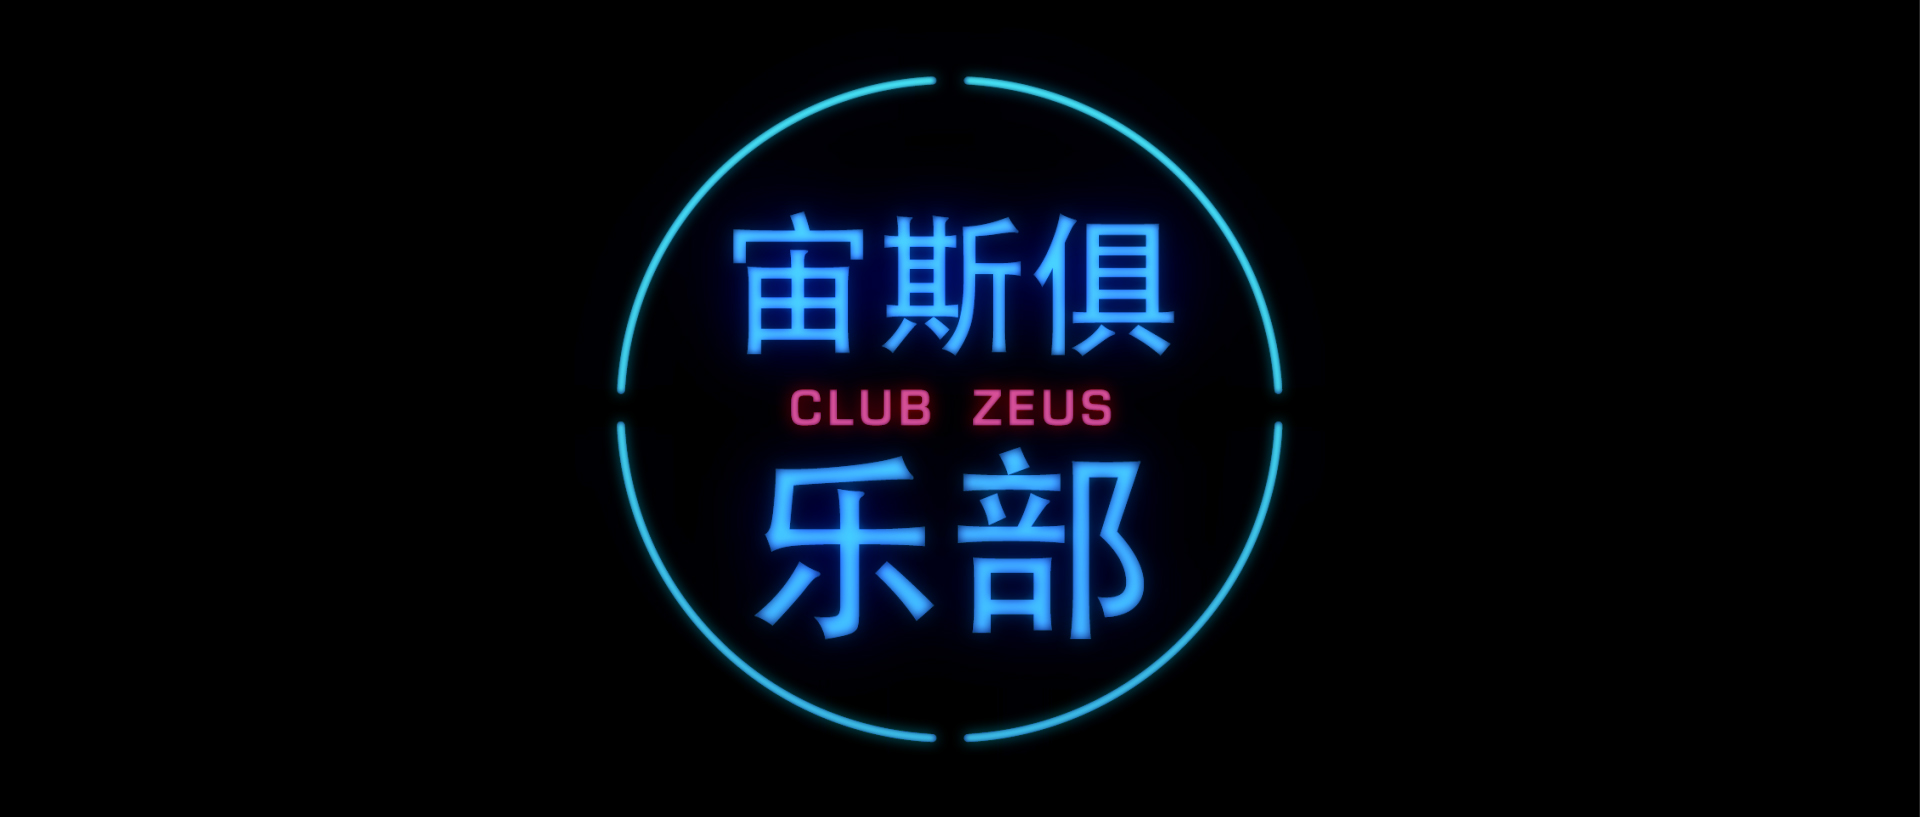 Club Zeus [ Revolver / Les Petites Lumières ]